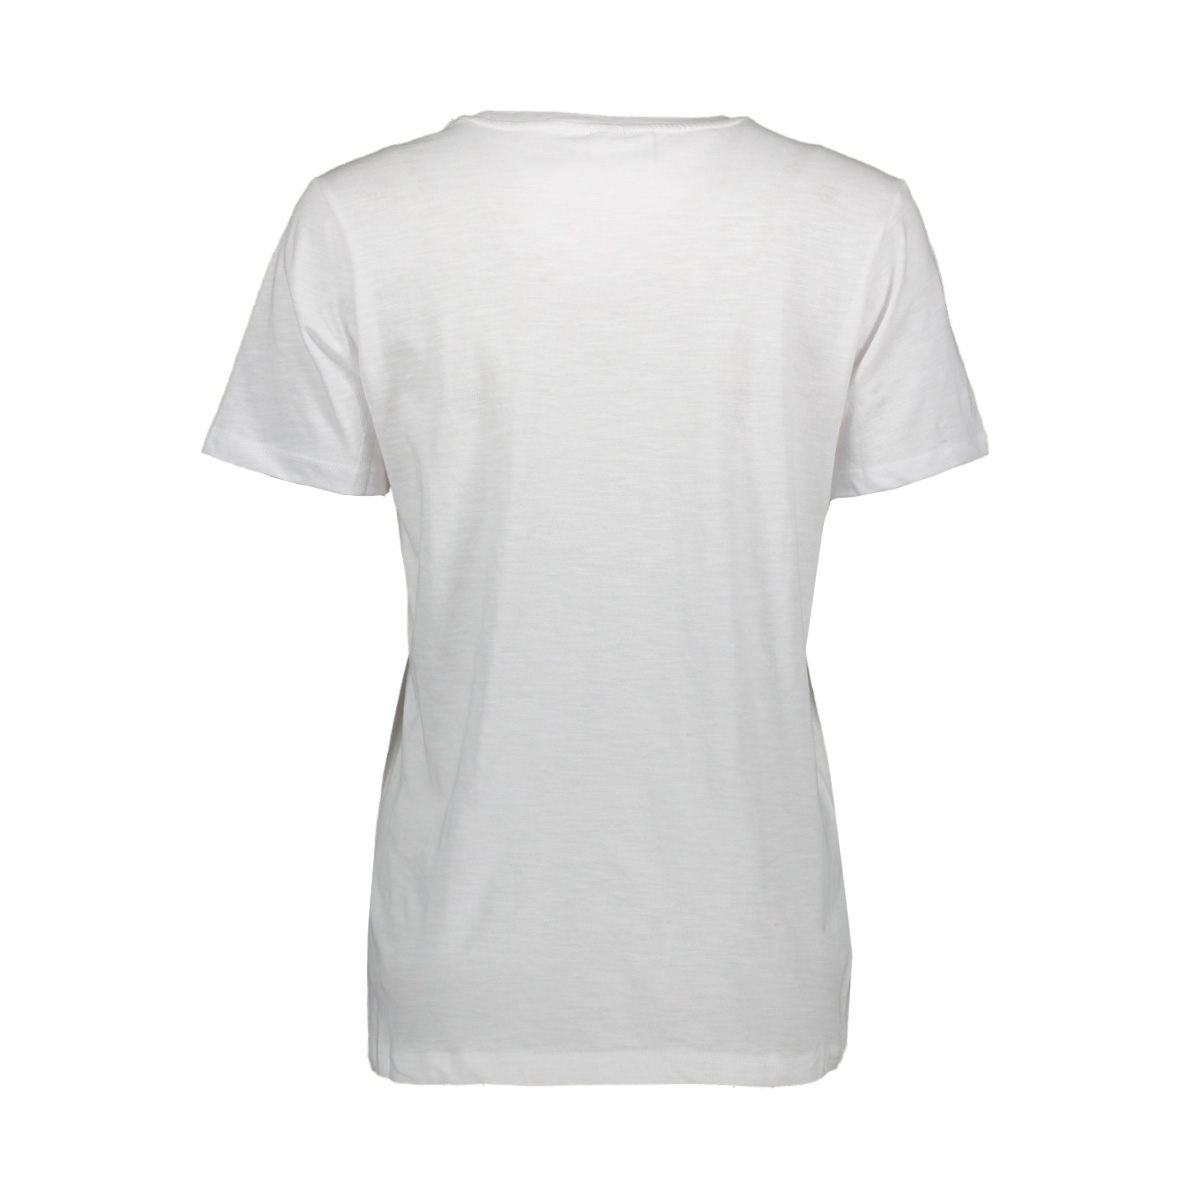 t shirt w flock print t1547 saint tropez t-shirt 1000